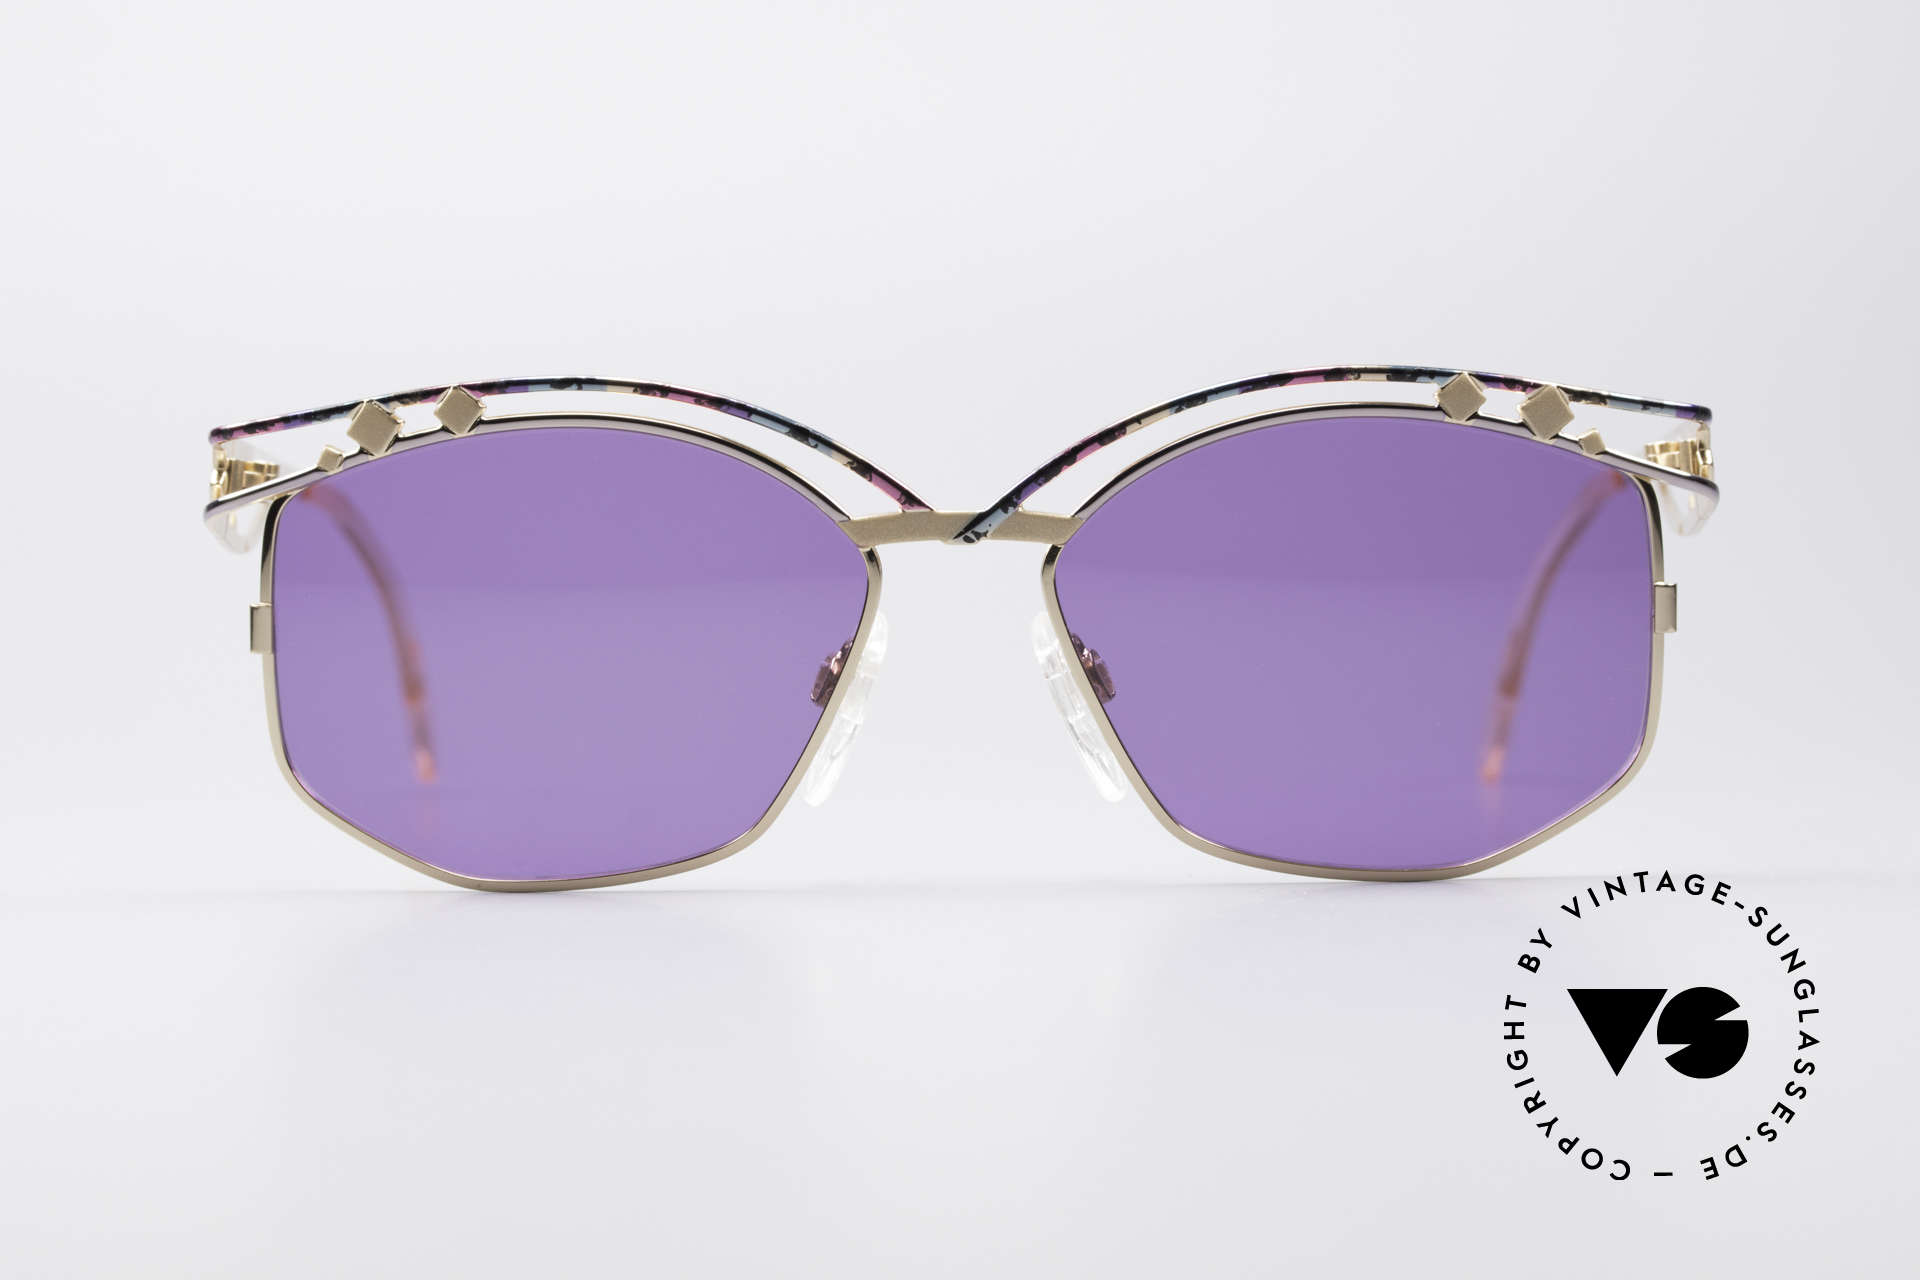 Cazal 280 90s Designer Sunglasses Ladies, distinctive creation by CAri ZALloni (Mr. CAZAL, RIP), Made for Women